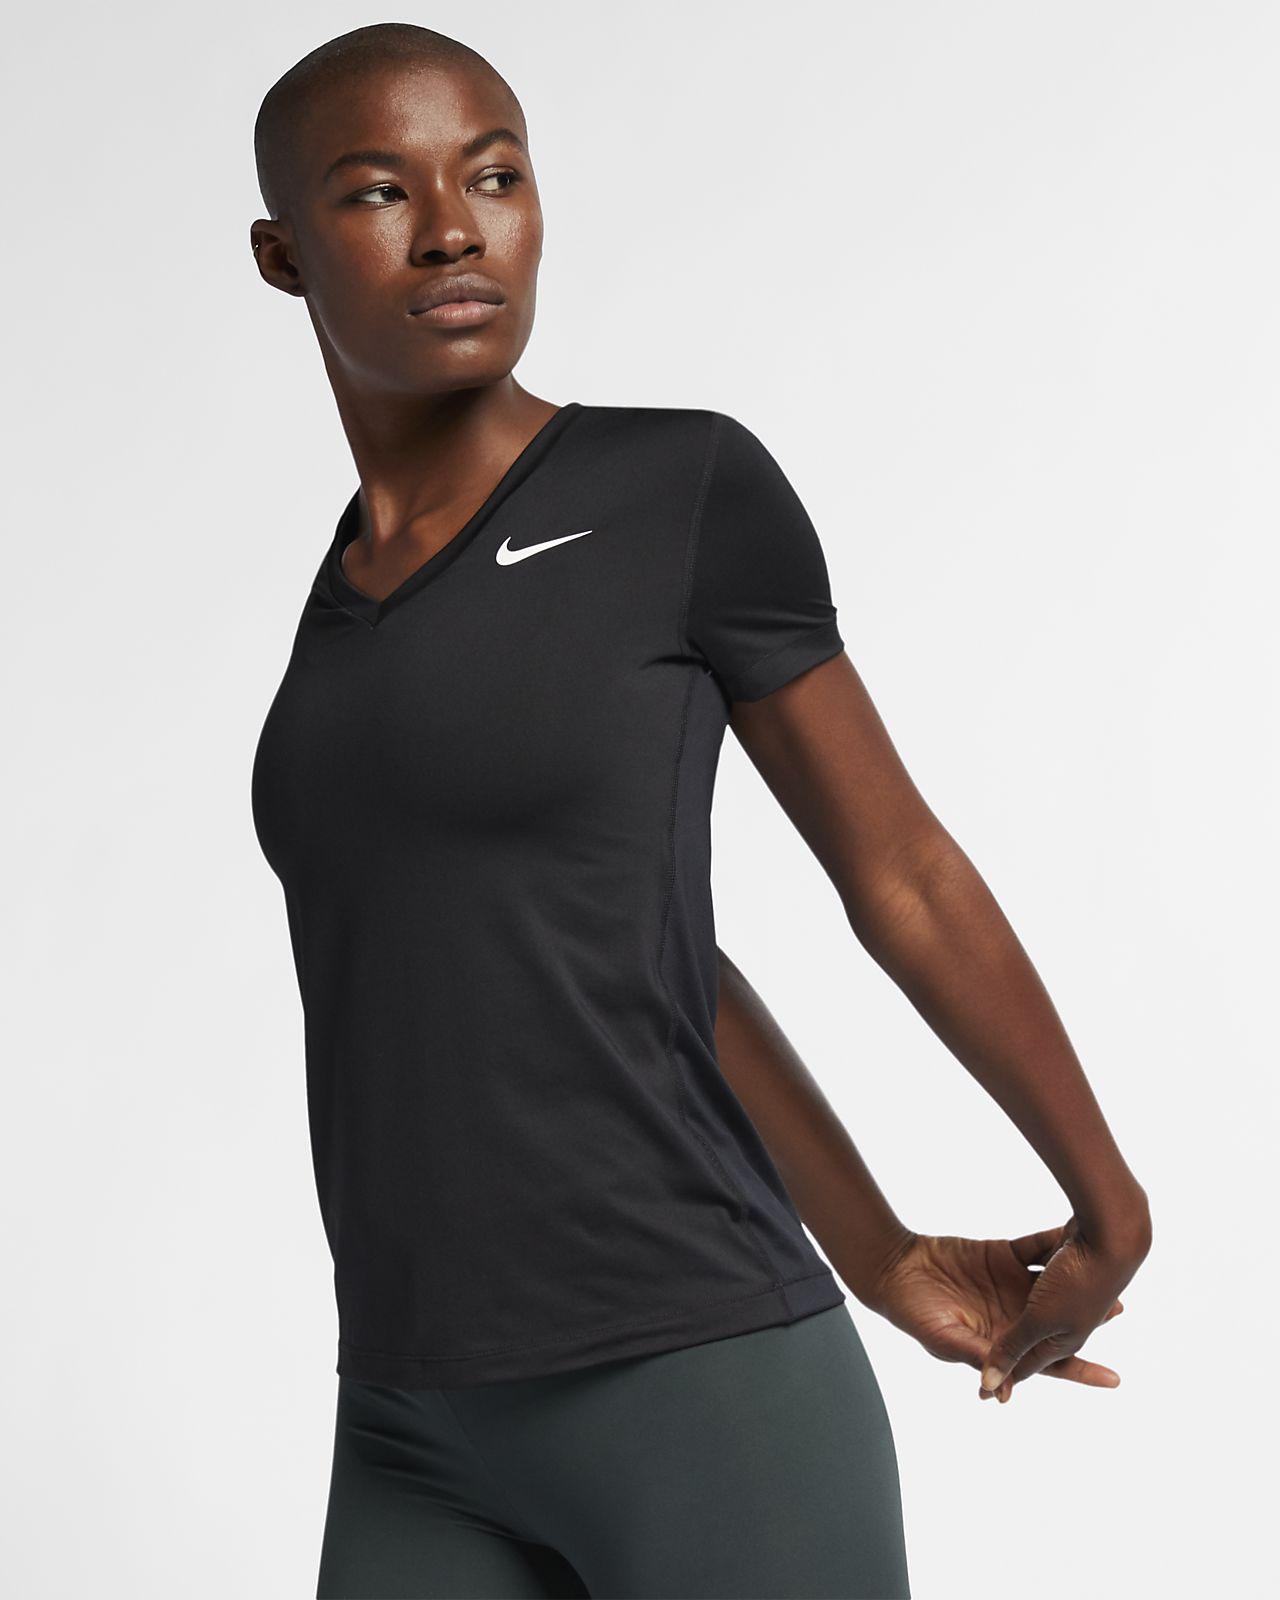 Nike Dri FIT Victory Women's Short Sleeve Training Top